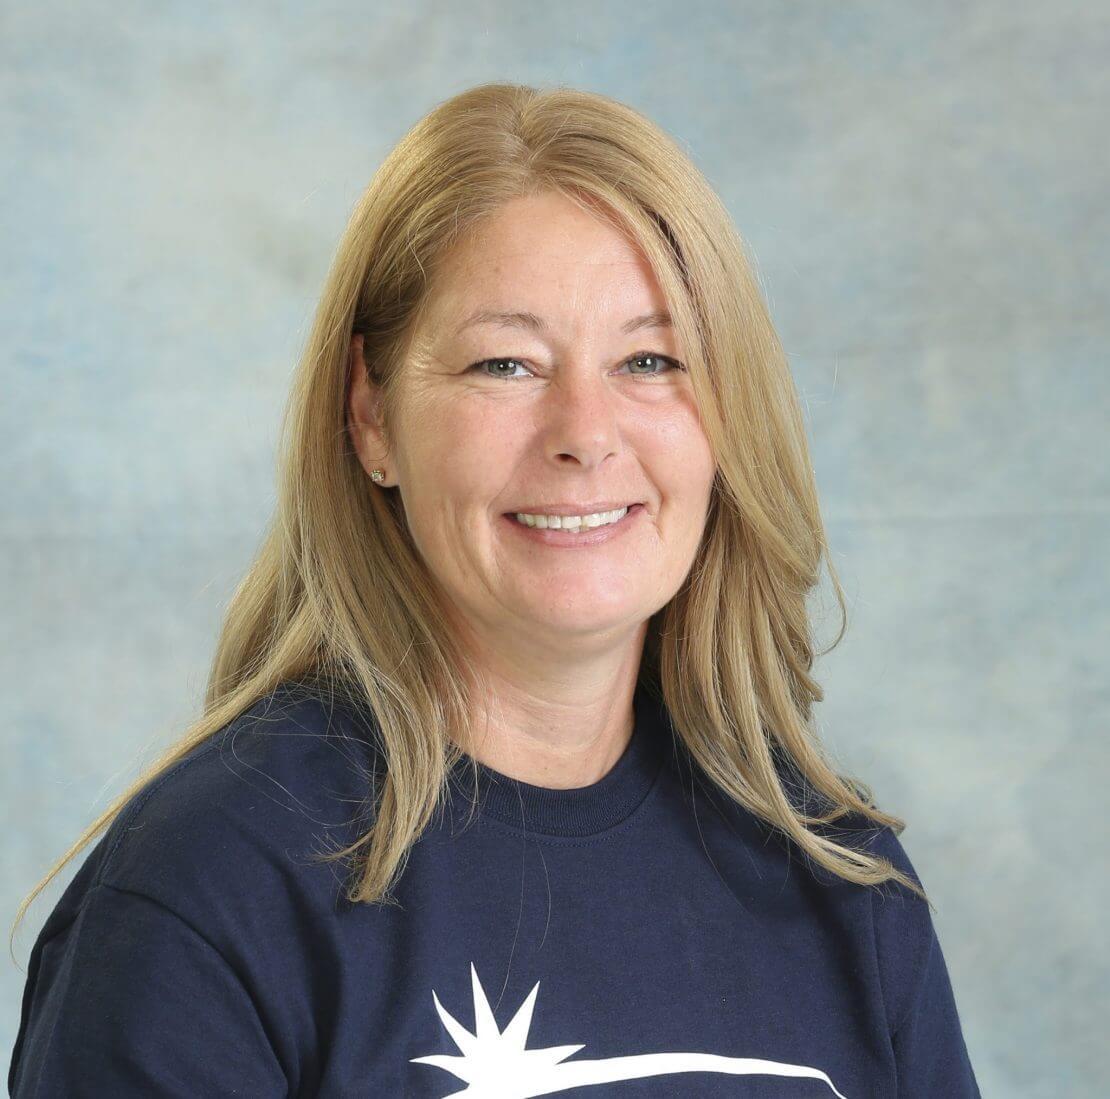 Marcy Landman Fayette County Practical Nursing Clinical Coordinator